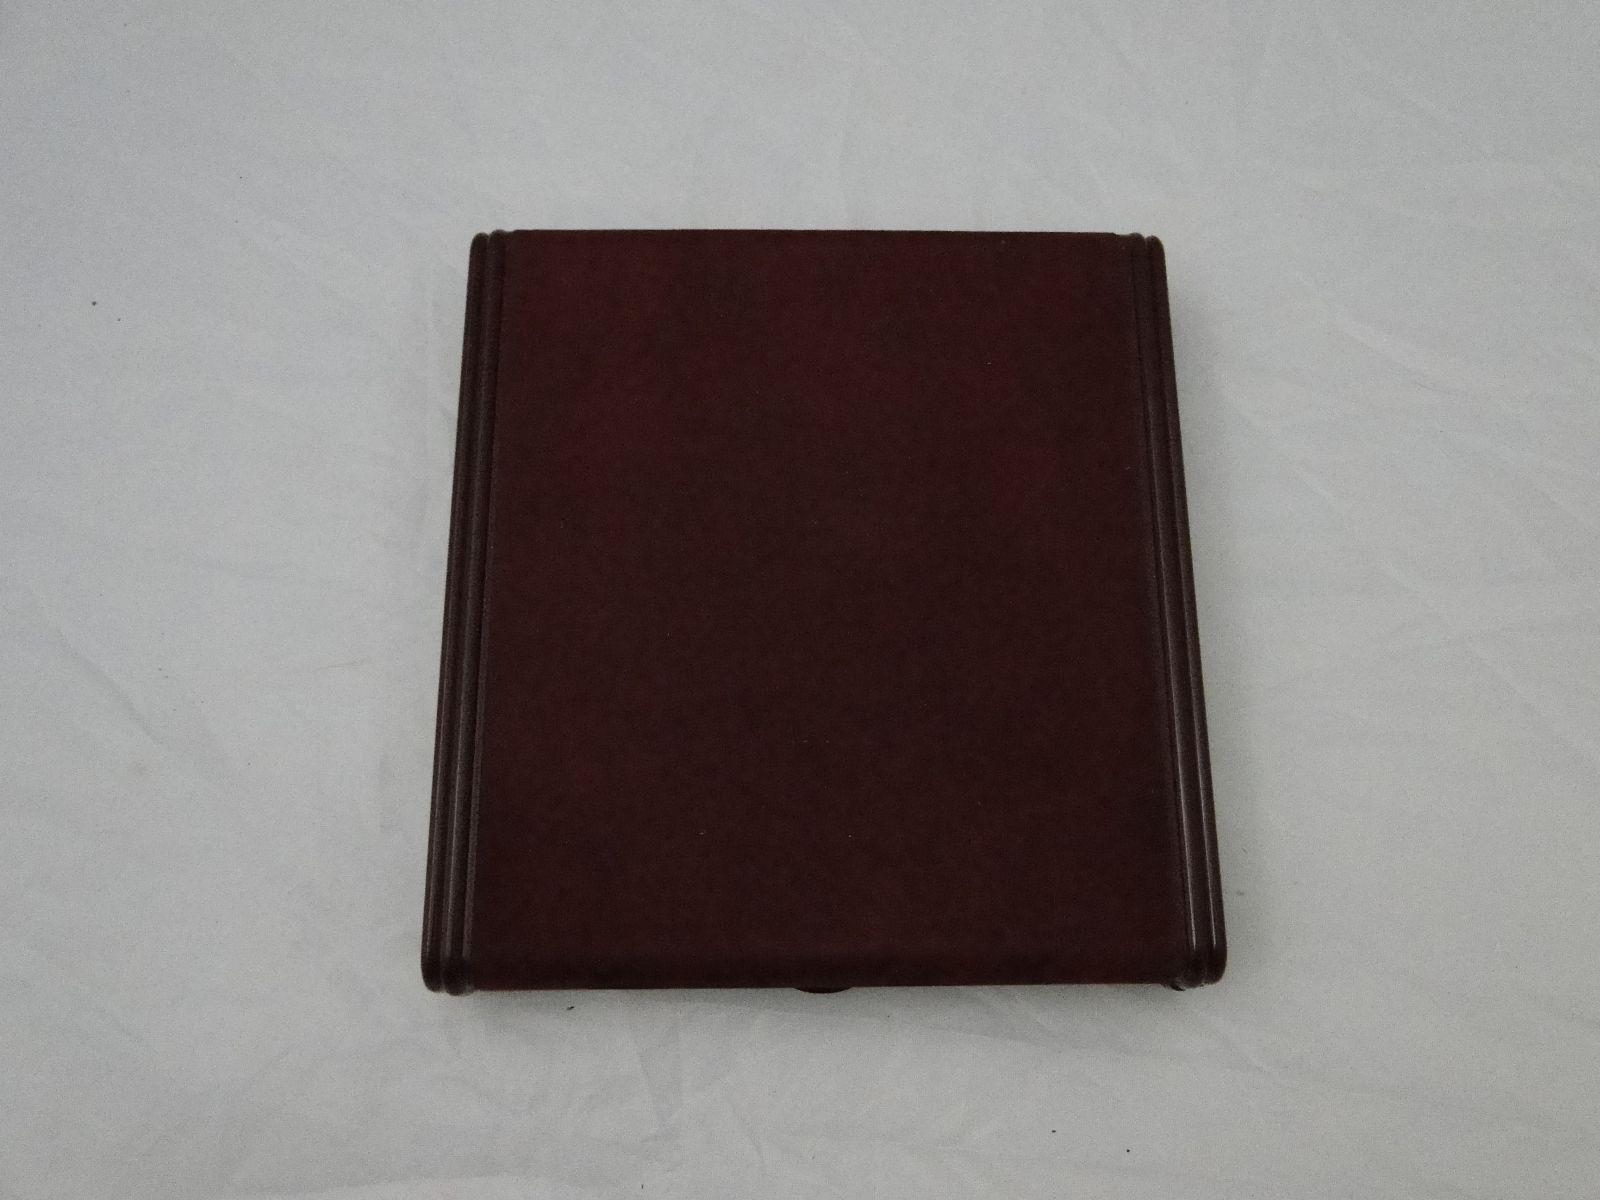 DSC08015.JPG (1600�1200)